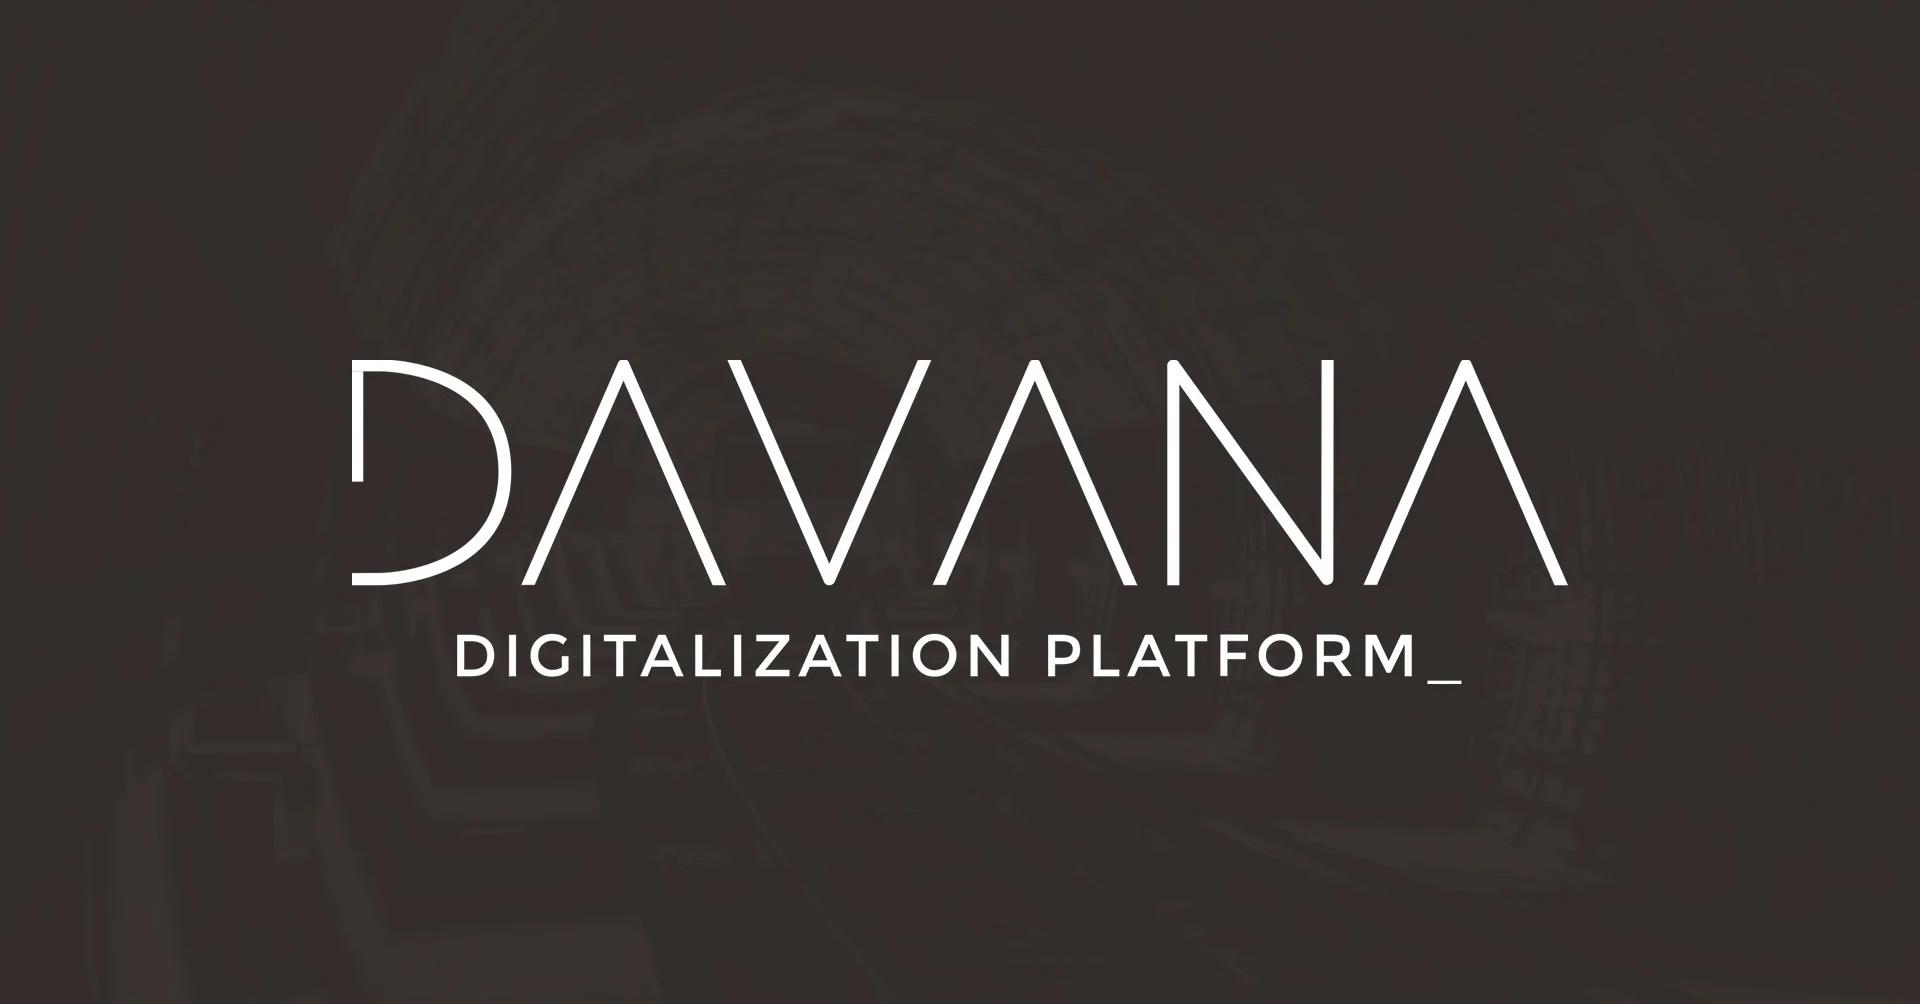 DAVANA Digitalization platform for railway